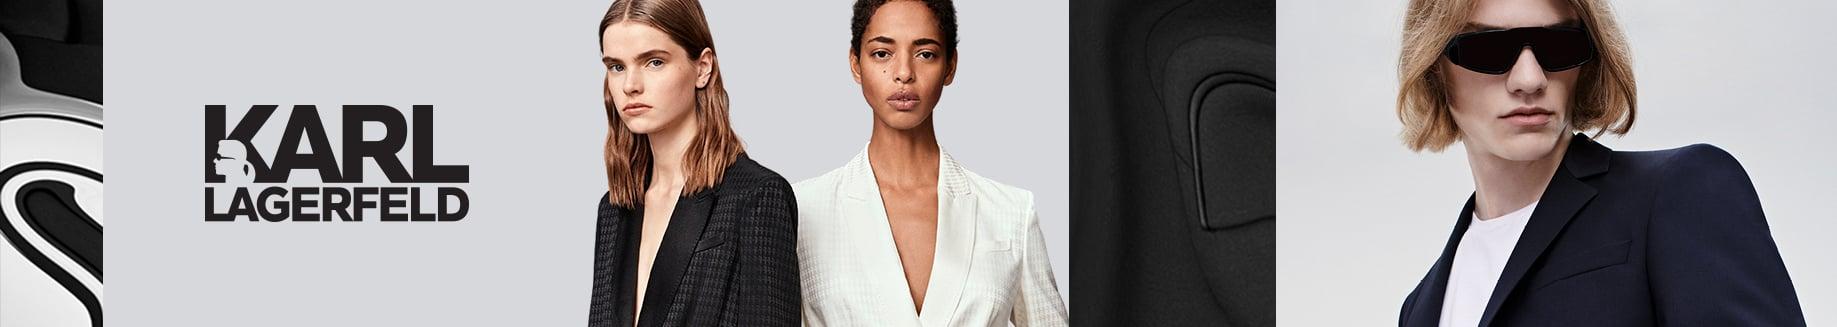 Товары Karl Lagerfeld для мужчин